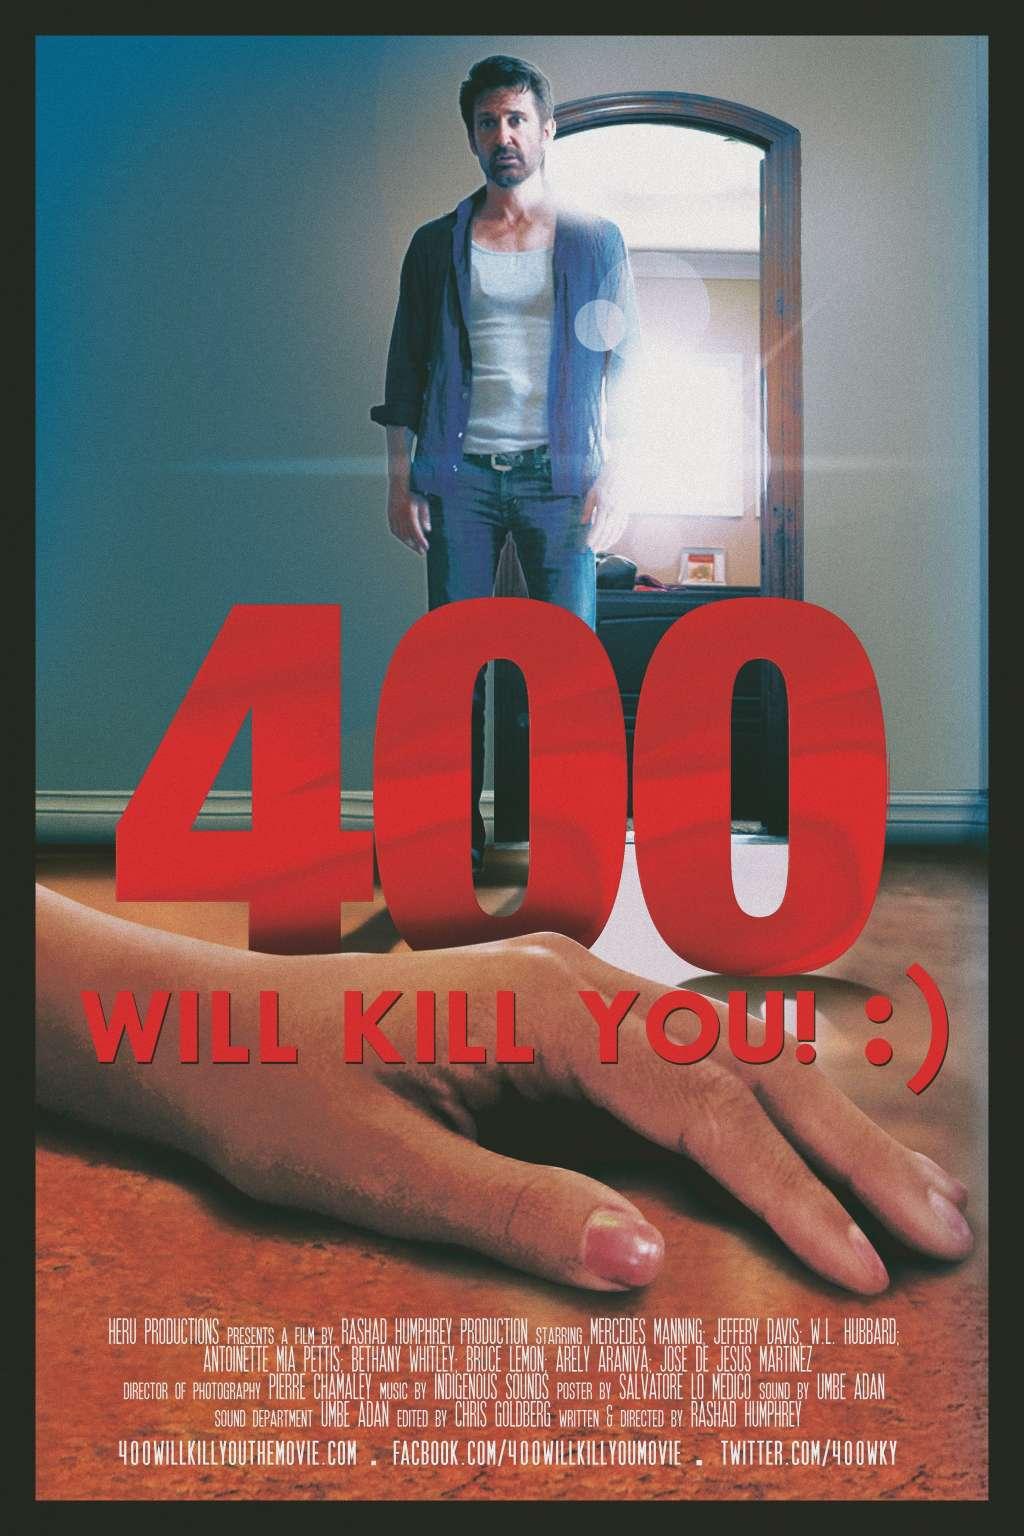 400 Will Kill You! :) kapak